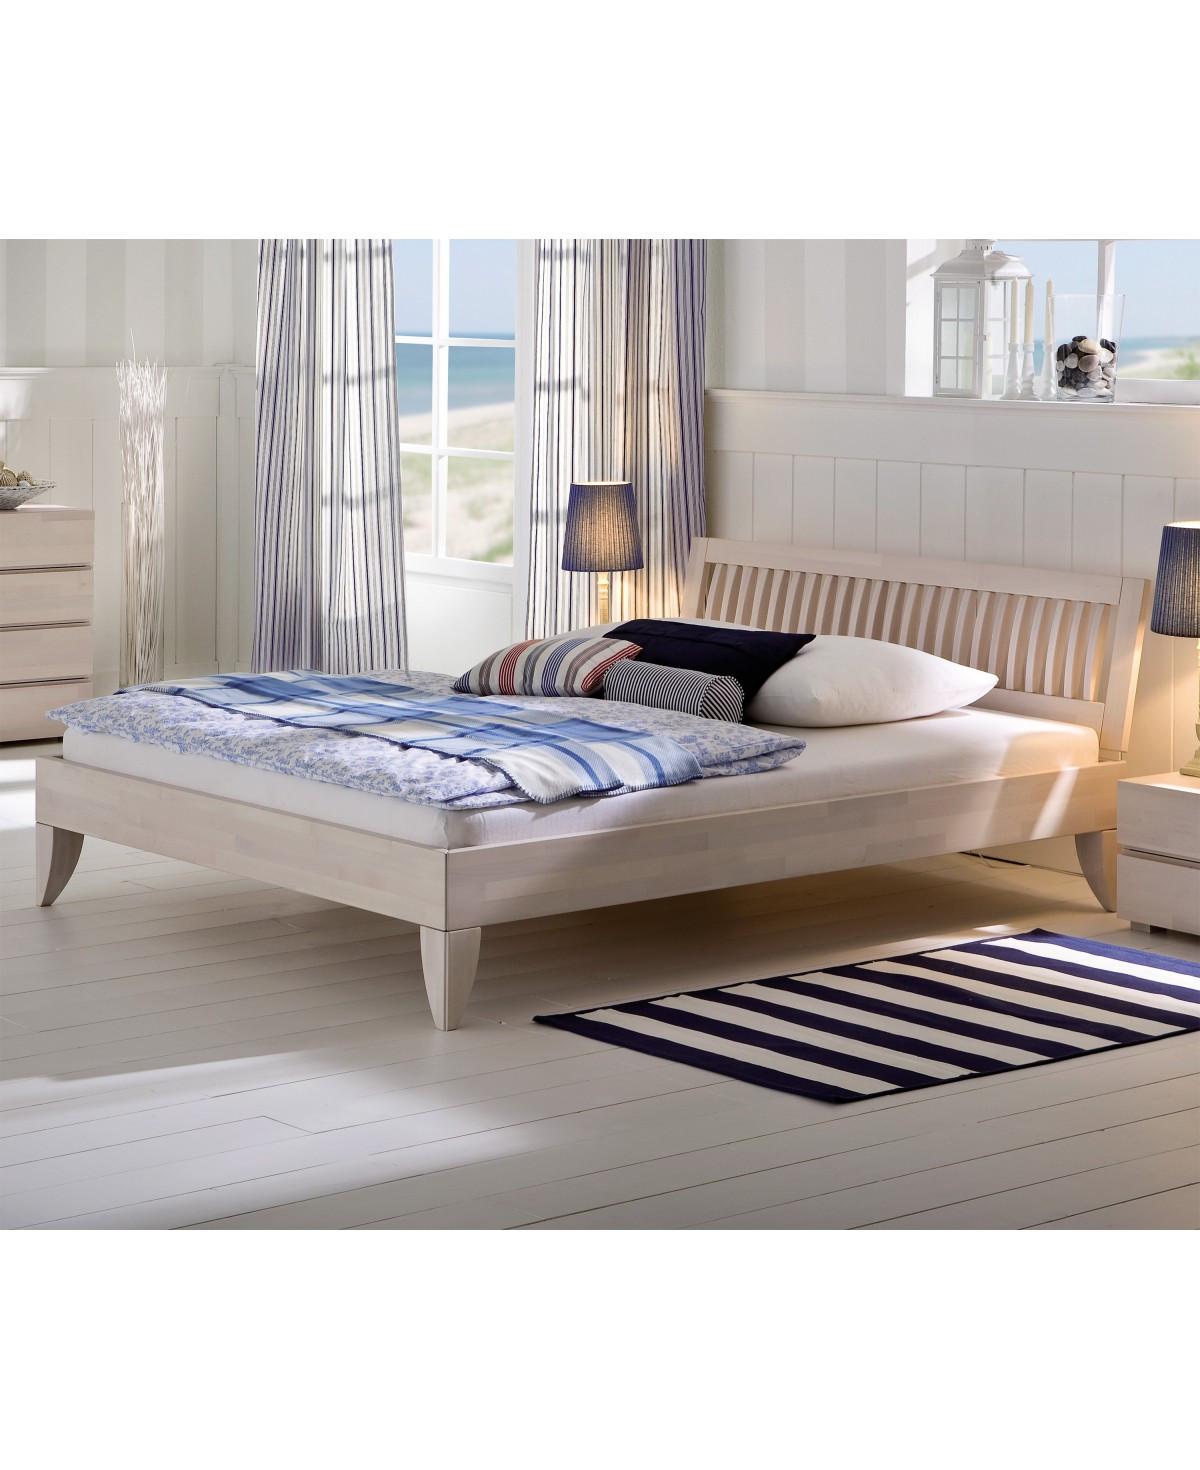 Full Size of Komplettbett 180x220 36 S8 Bett Ikea Fhrung Wohnzimmer Komplettbett 180x220